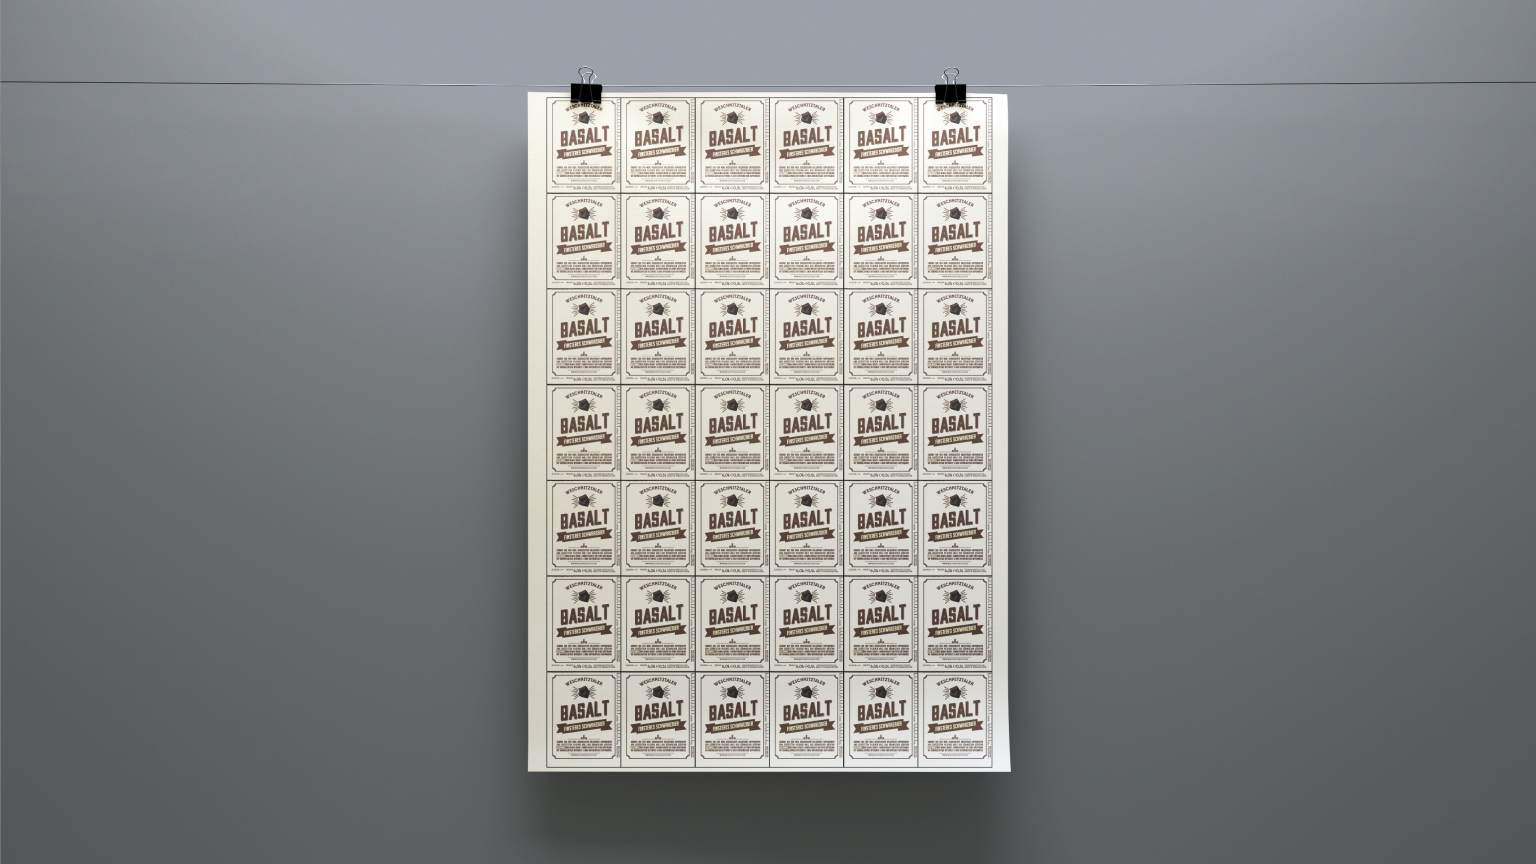 Photorealistic_poster_mock-up_kit_standalone.jpg